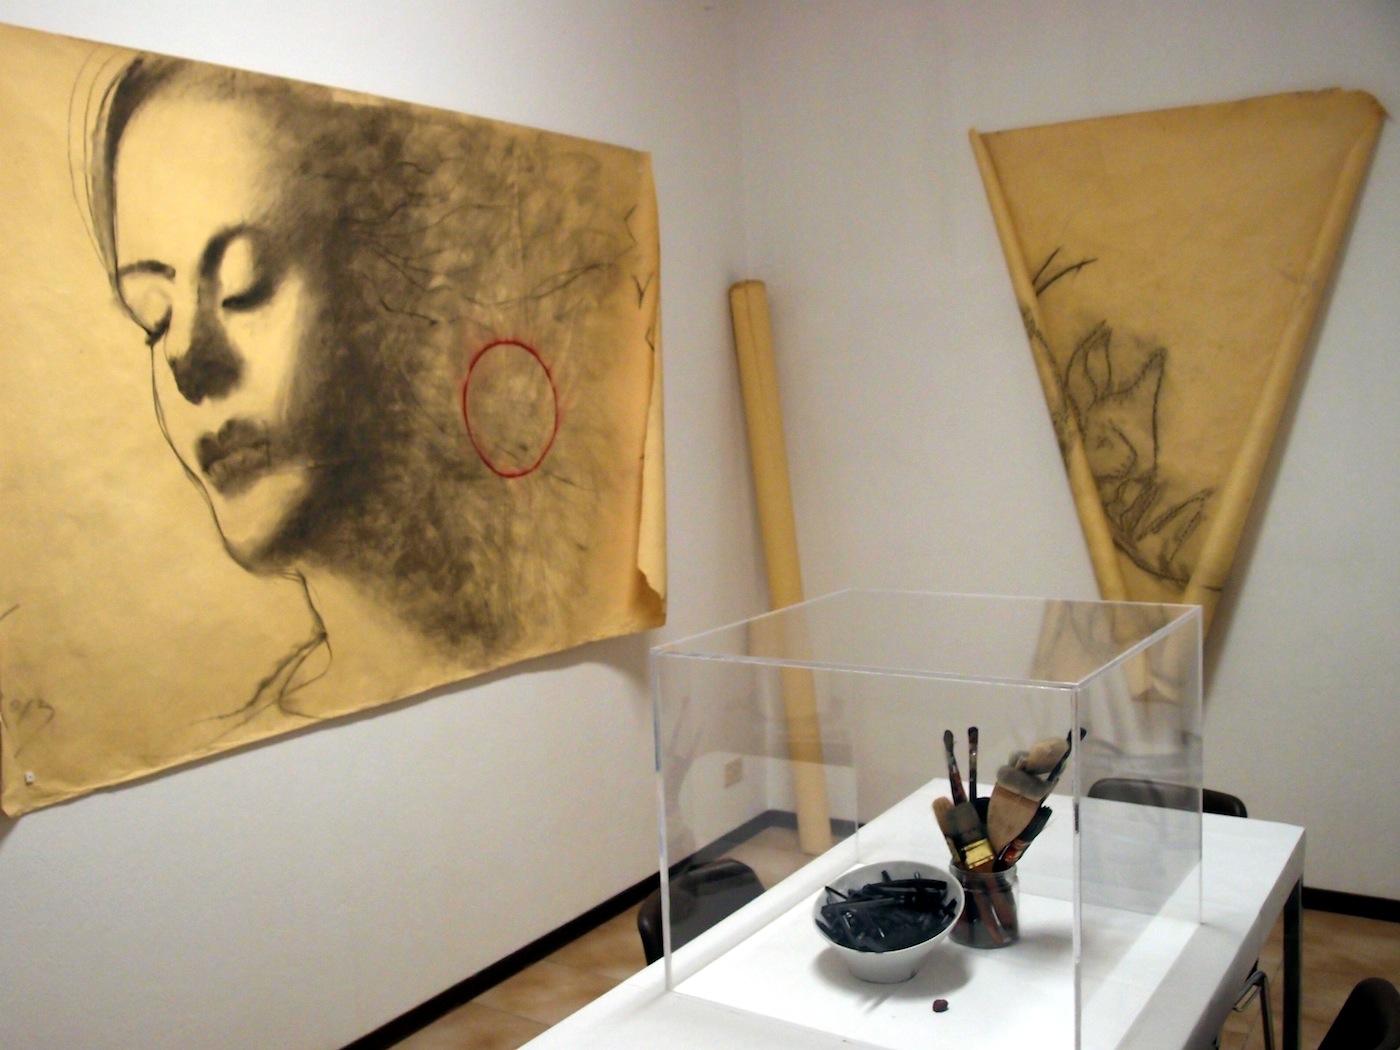 Atelier Galliani, Veduta allestimento, Ex Macello, Montecchio Emilia (RE)